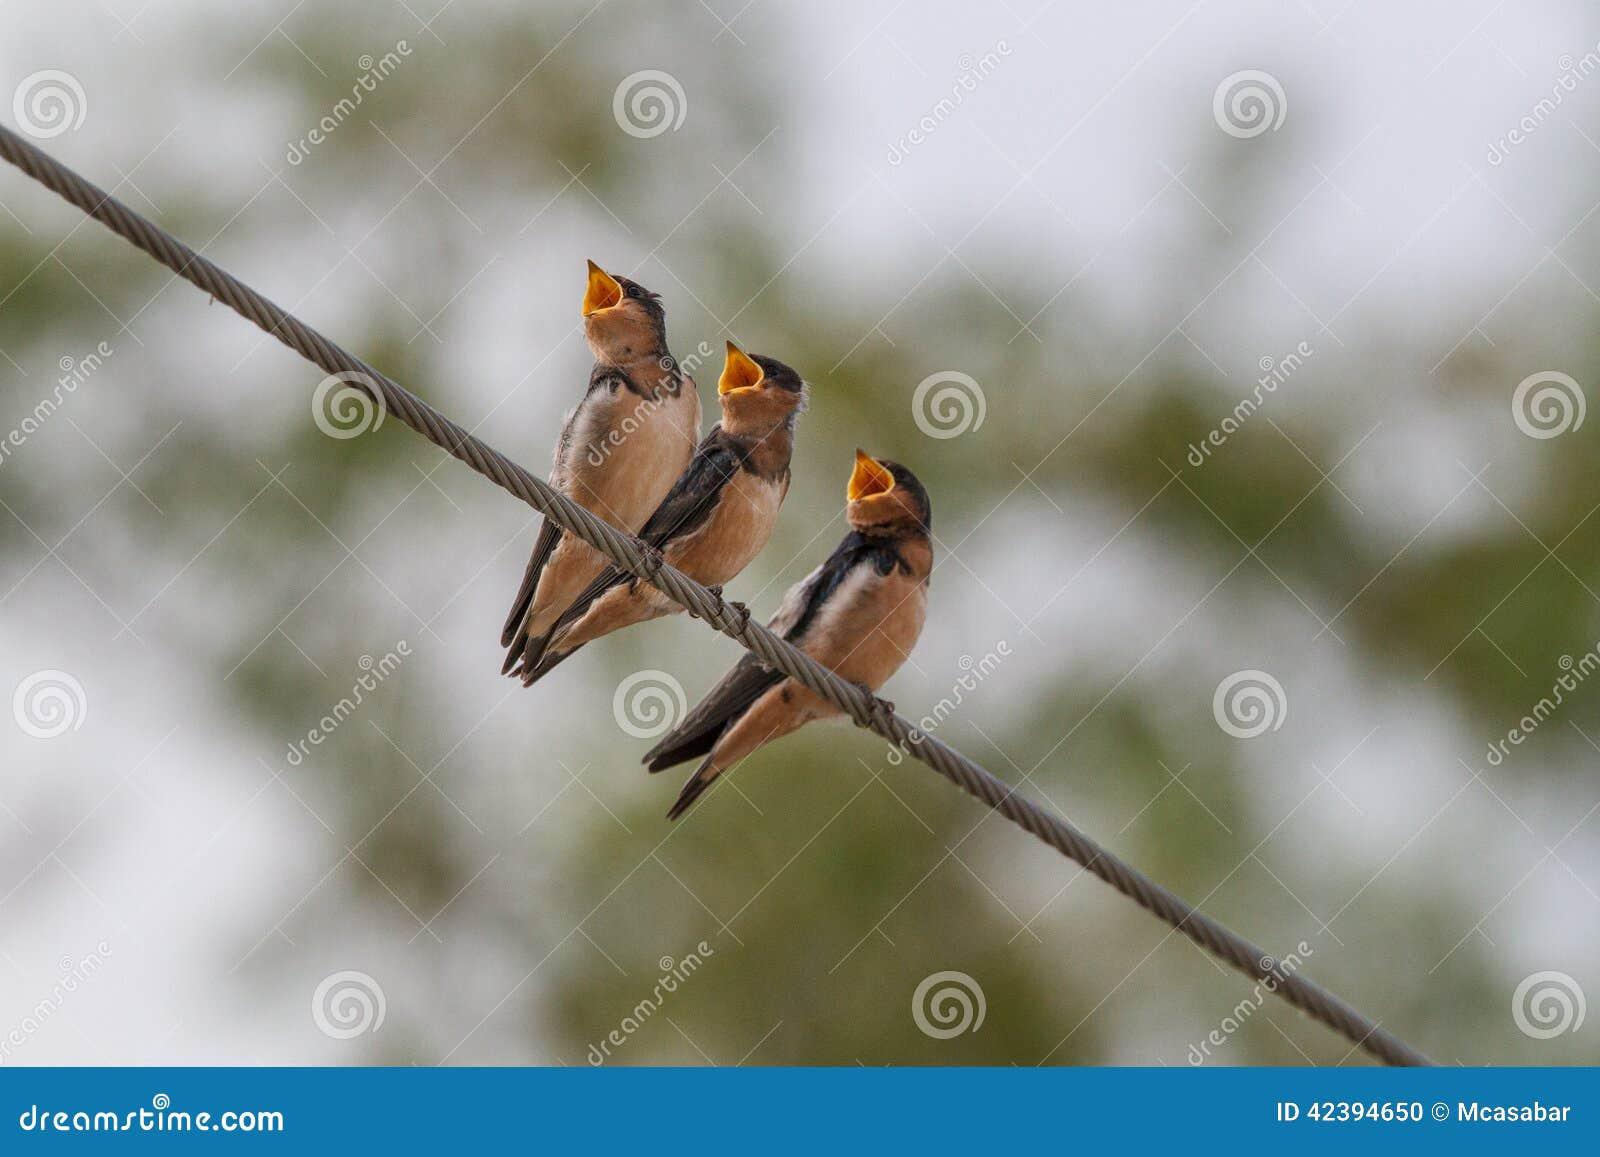 Three hungry birds